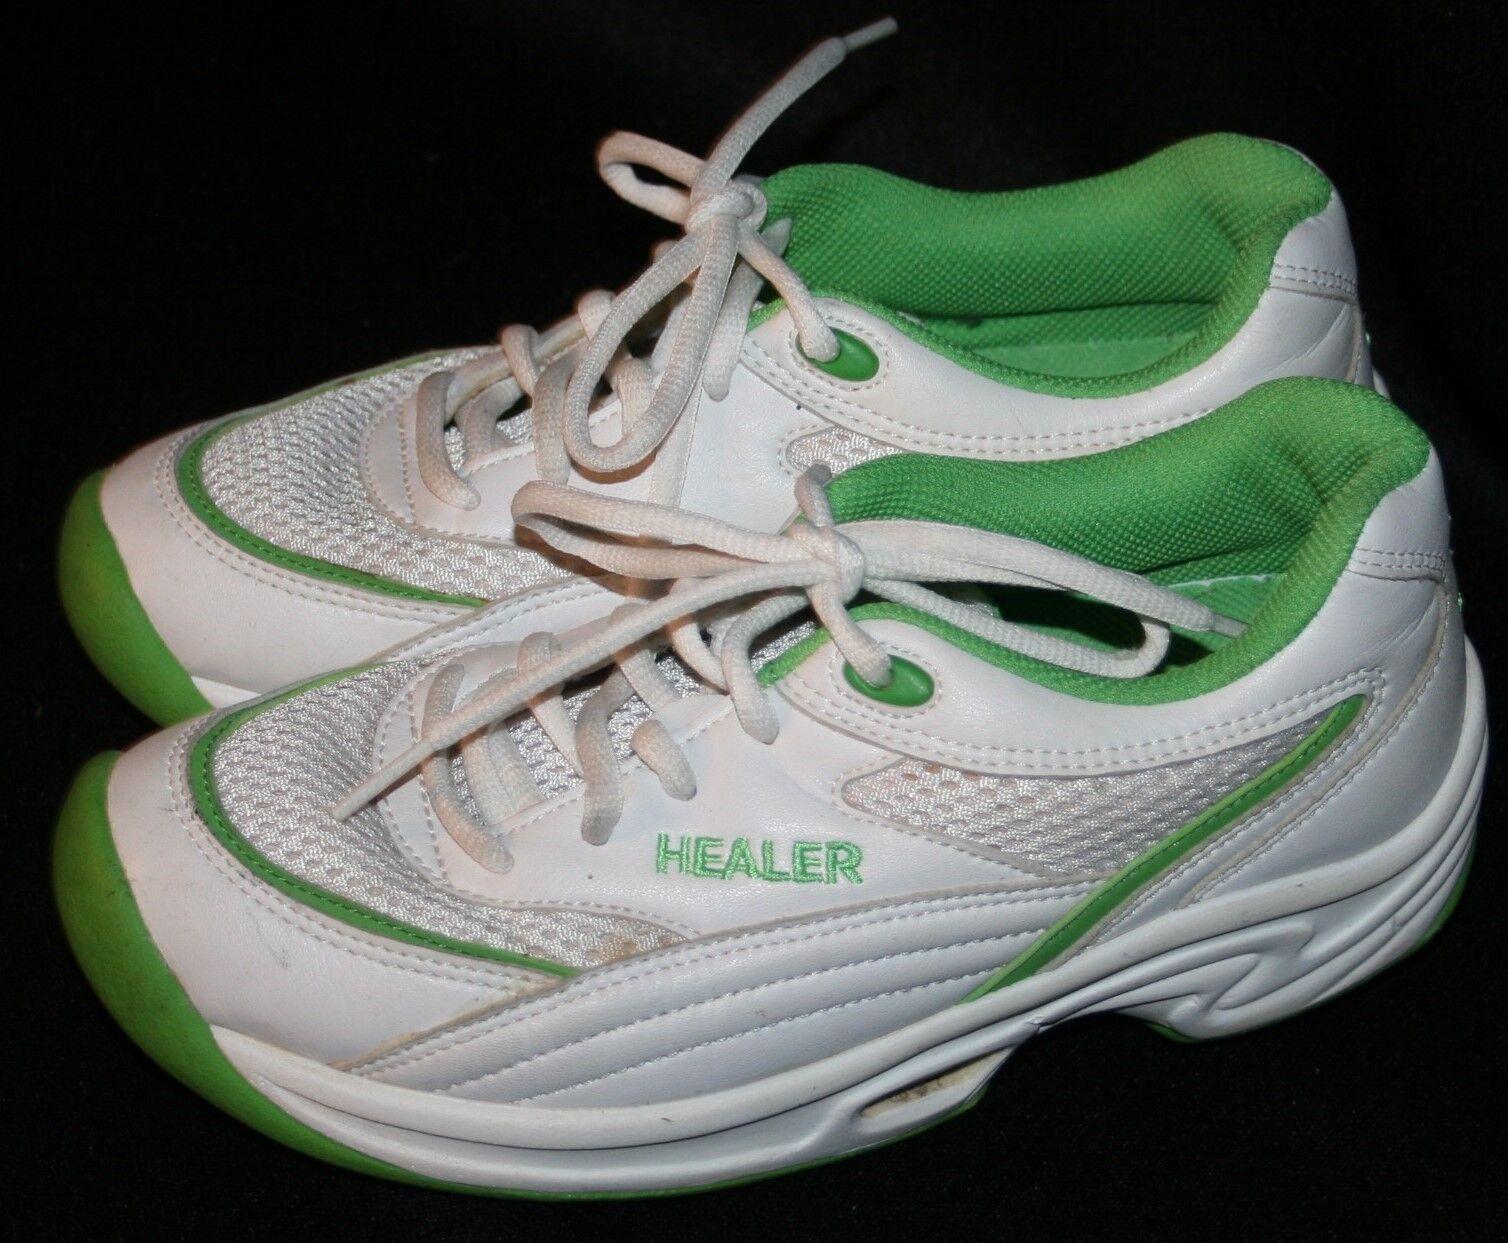 Healer Sneakers Athletic shoes 6 Korean White Green Walking Toning Korea Healers